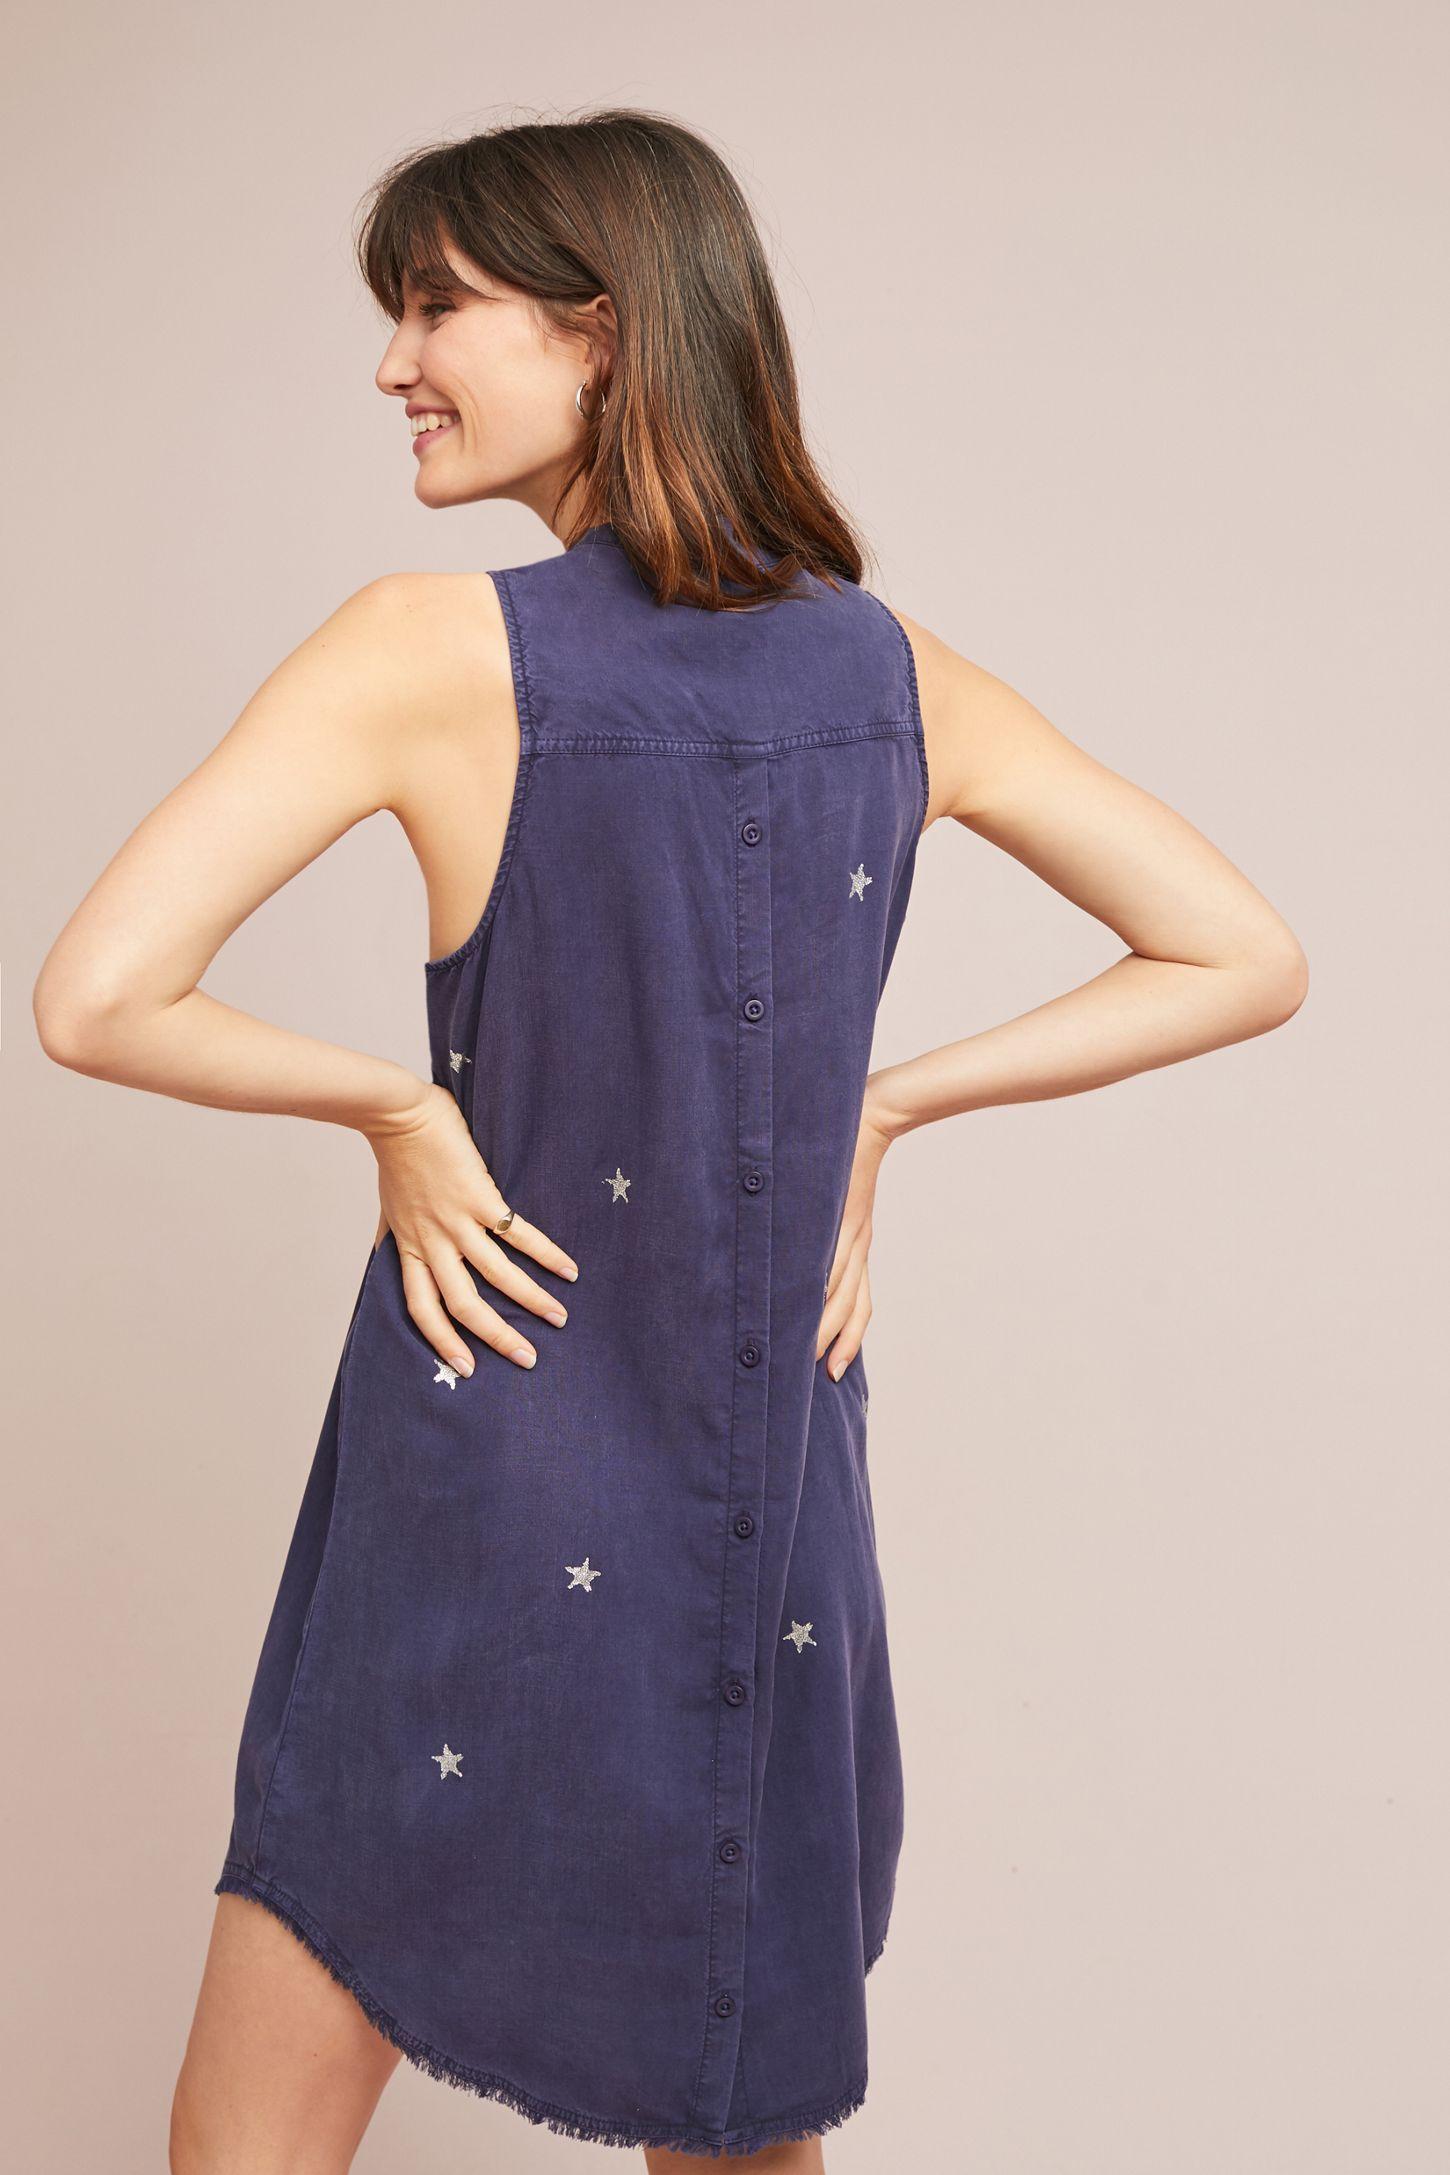 c06f33f99f Slide View  2  Cloth   Stone Maroney Shirtdress